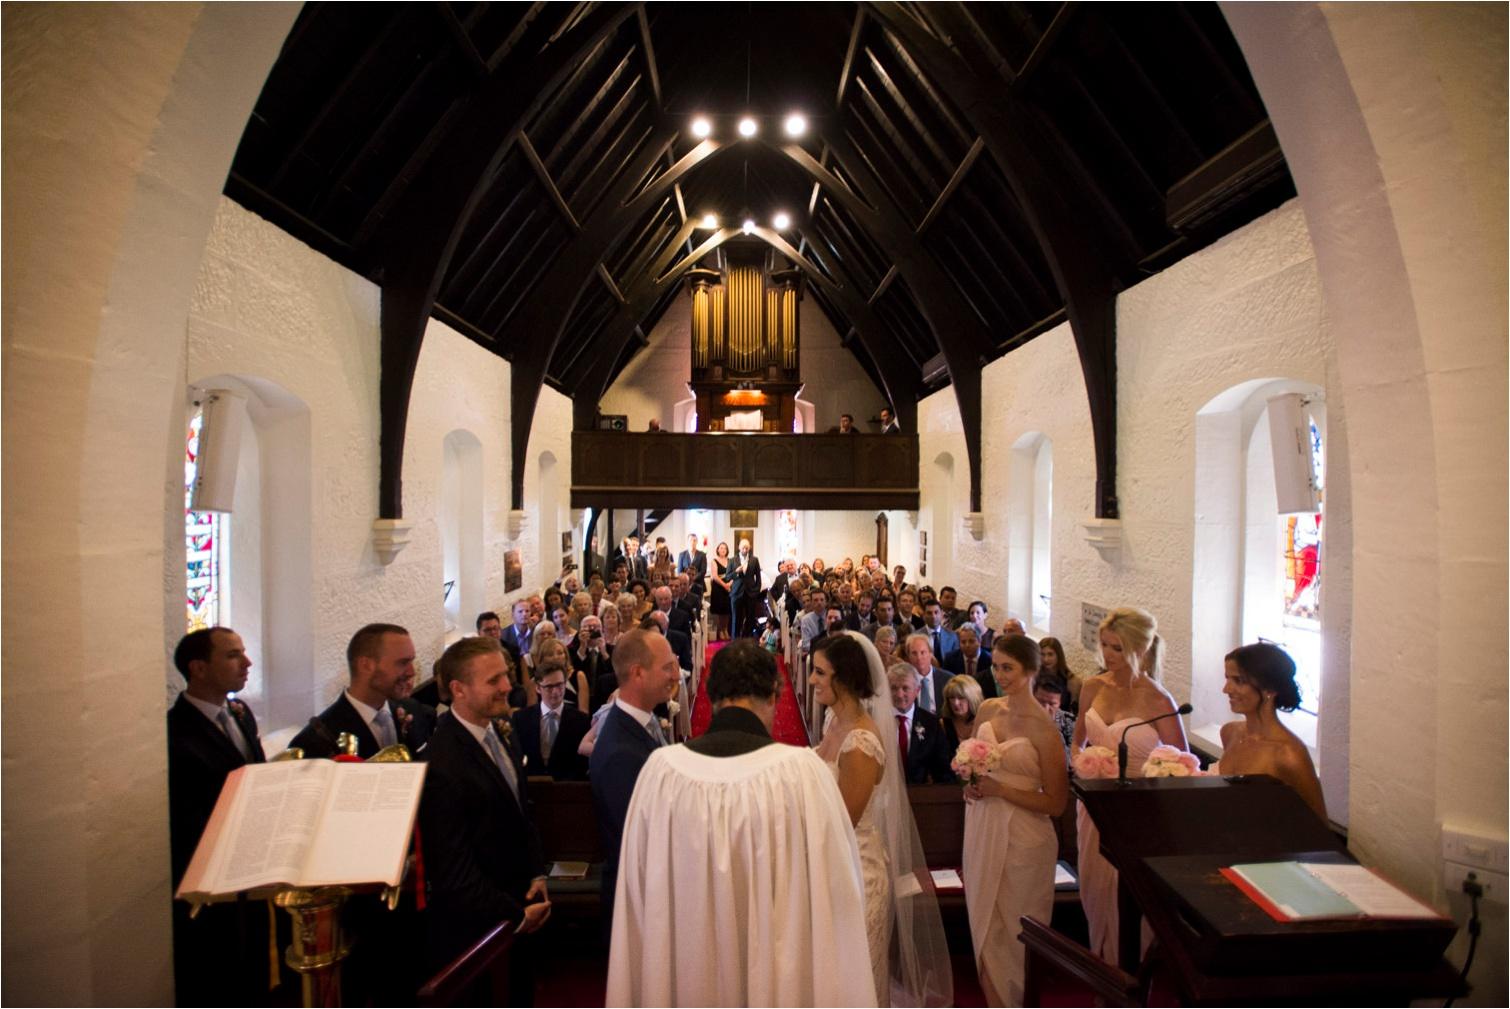 Nicole&Carlie_Watsons_Bay_Hotel_Wedding_by_Gold_Coast_Photographers-The_Follans17.jpg